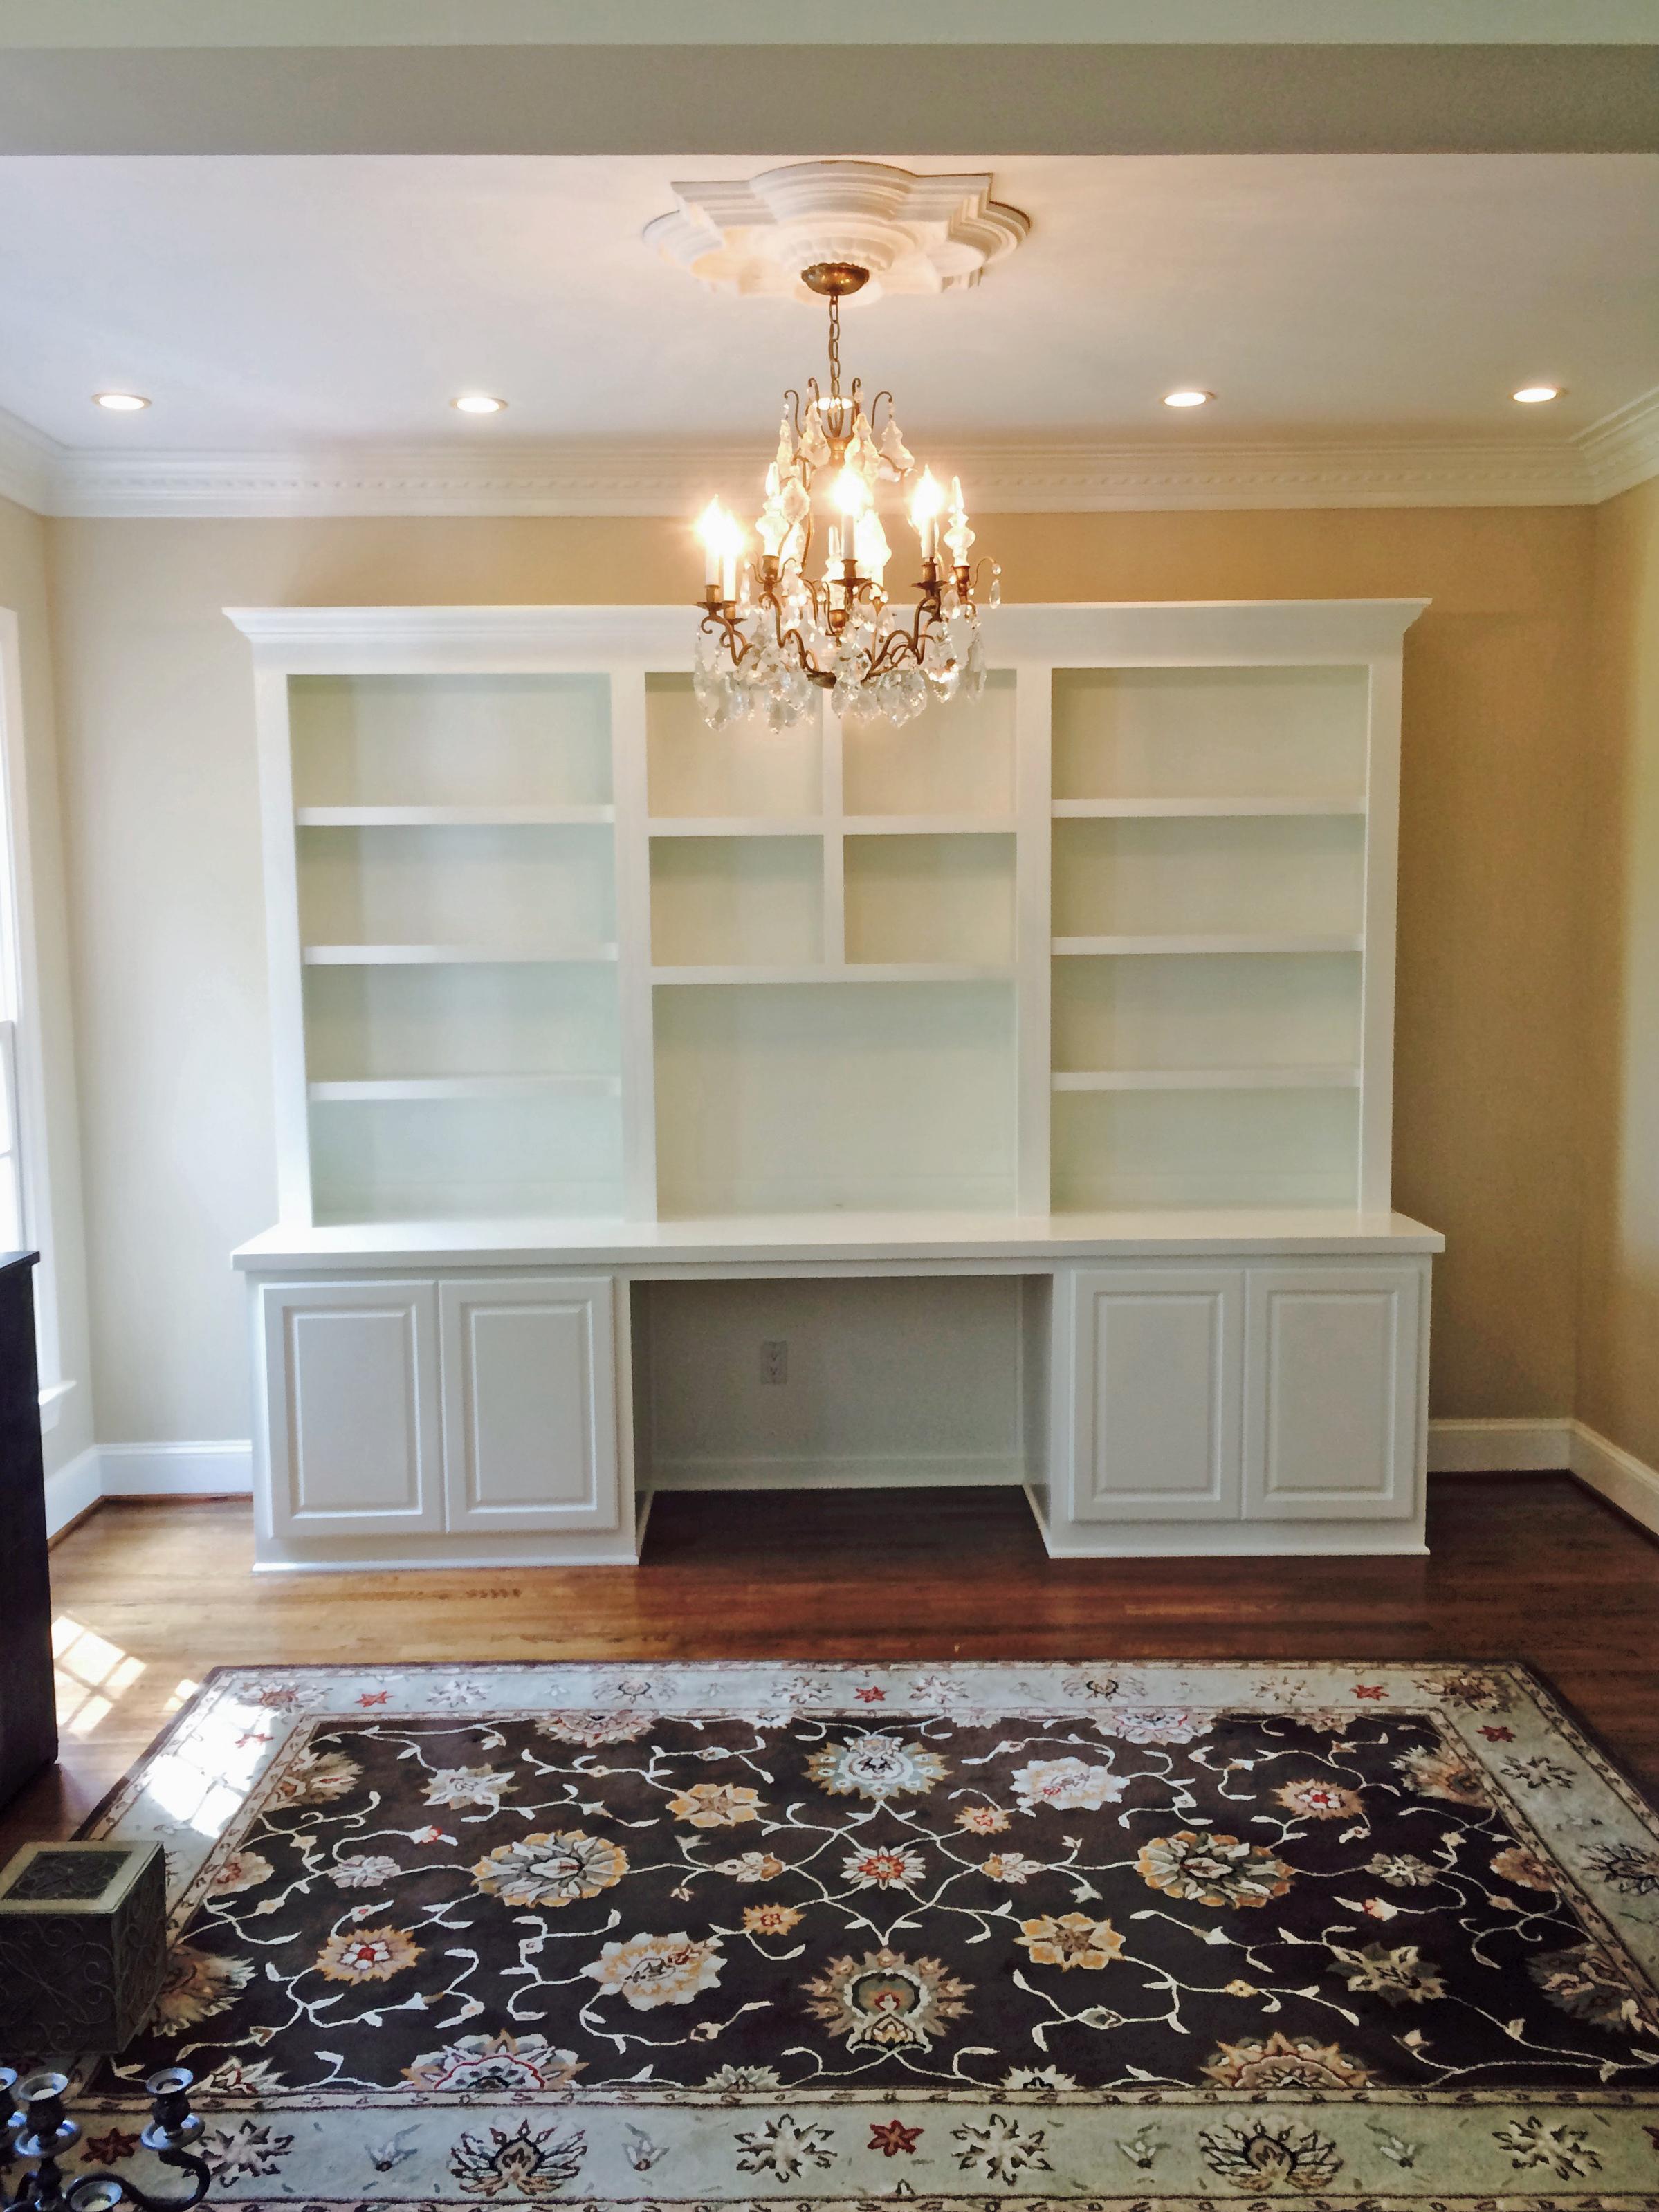 Custom Desk with Raised Panel Doors, Painted Countertop & Adjustable Shelves